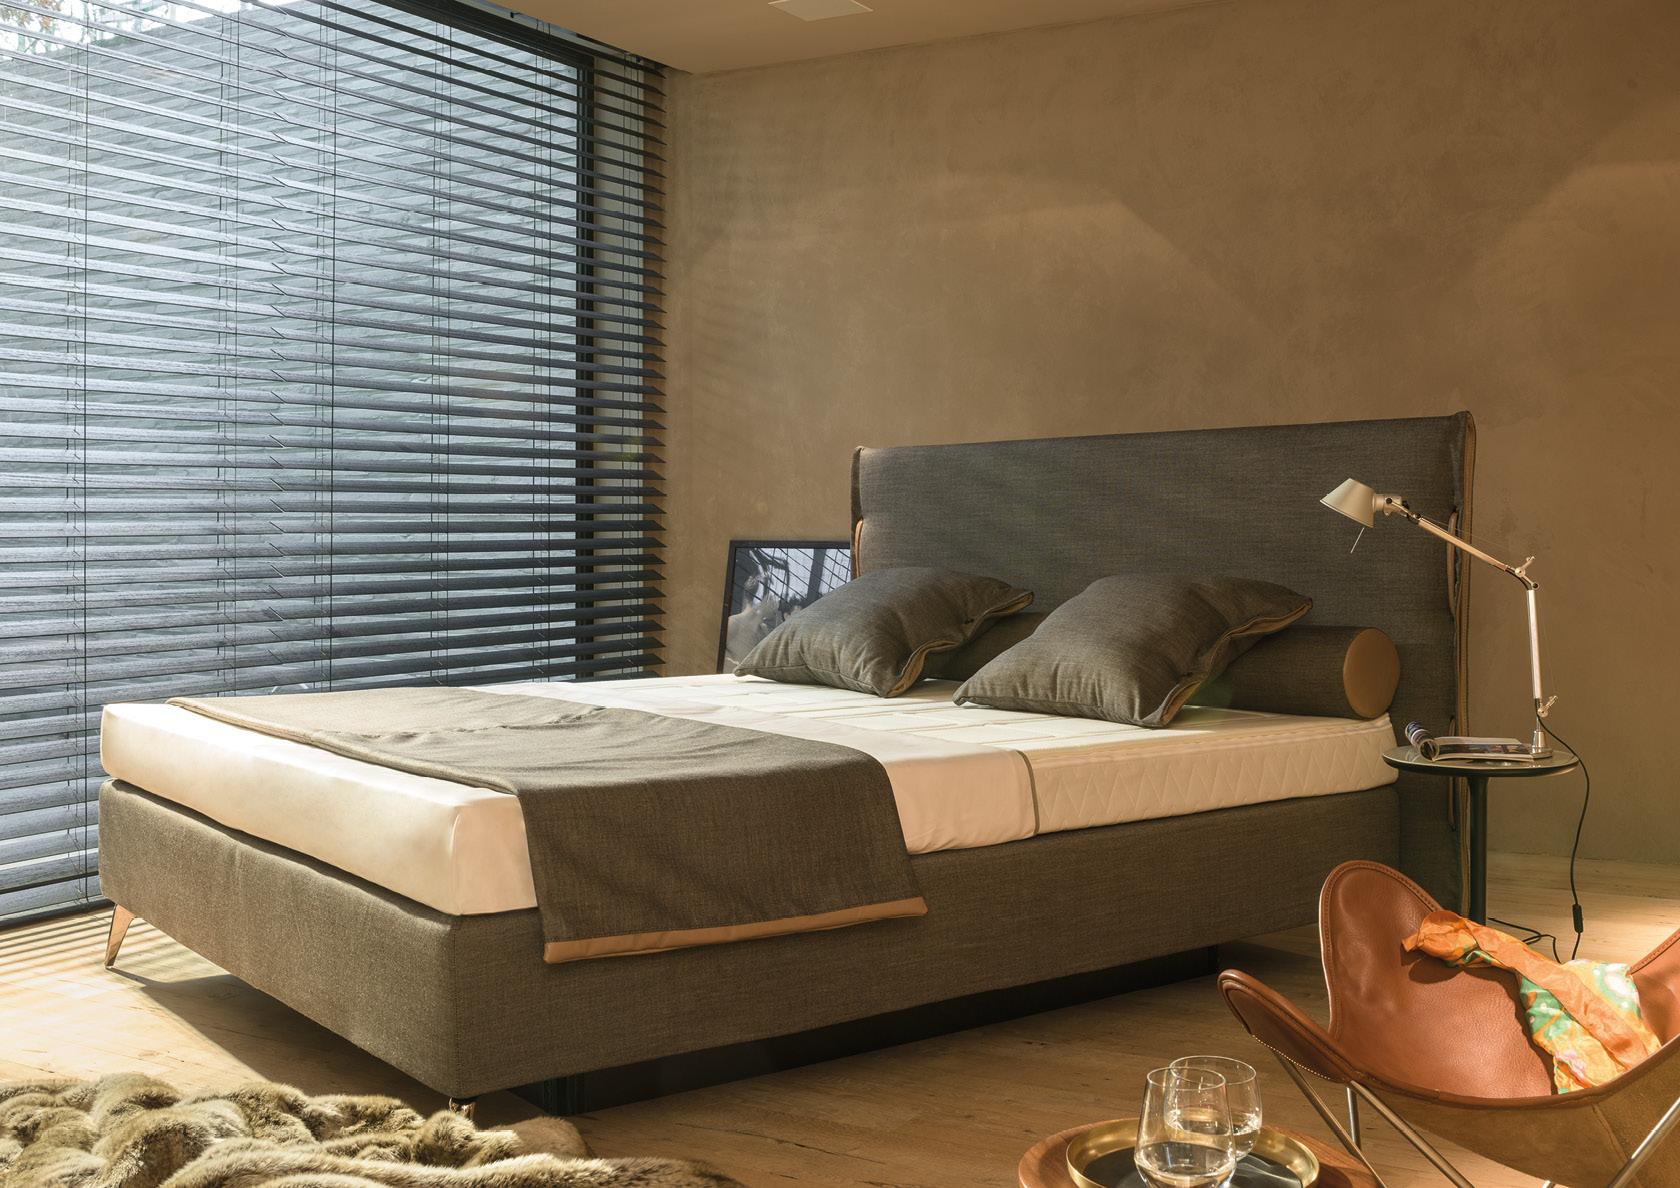 wasserbetten betten thoba handels gmbh. Black Bedroom Furniture Sets. Home Design Ideas